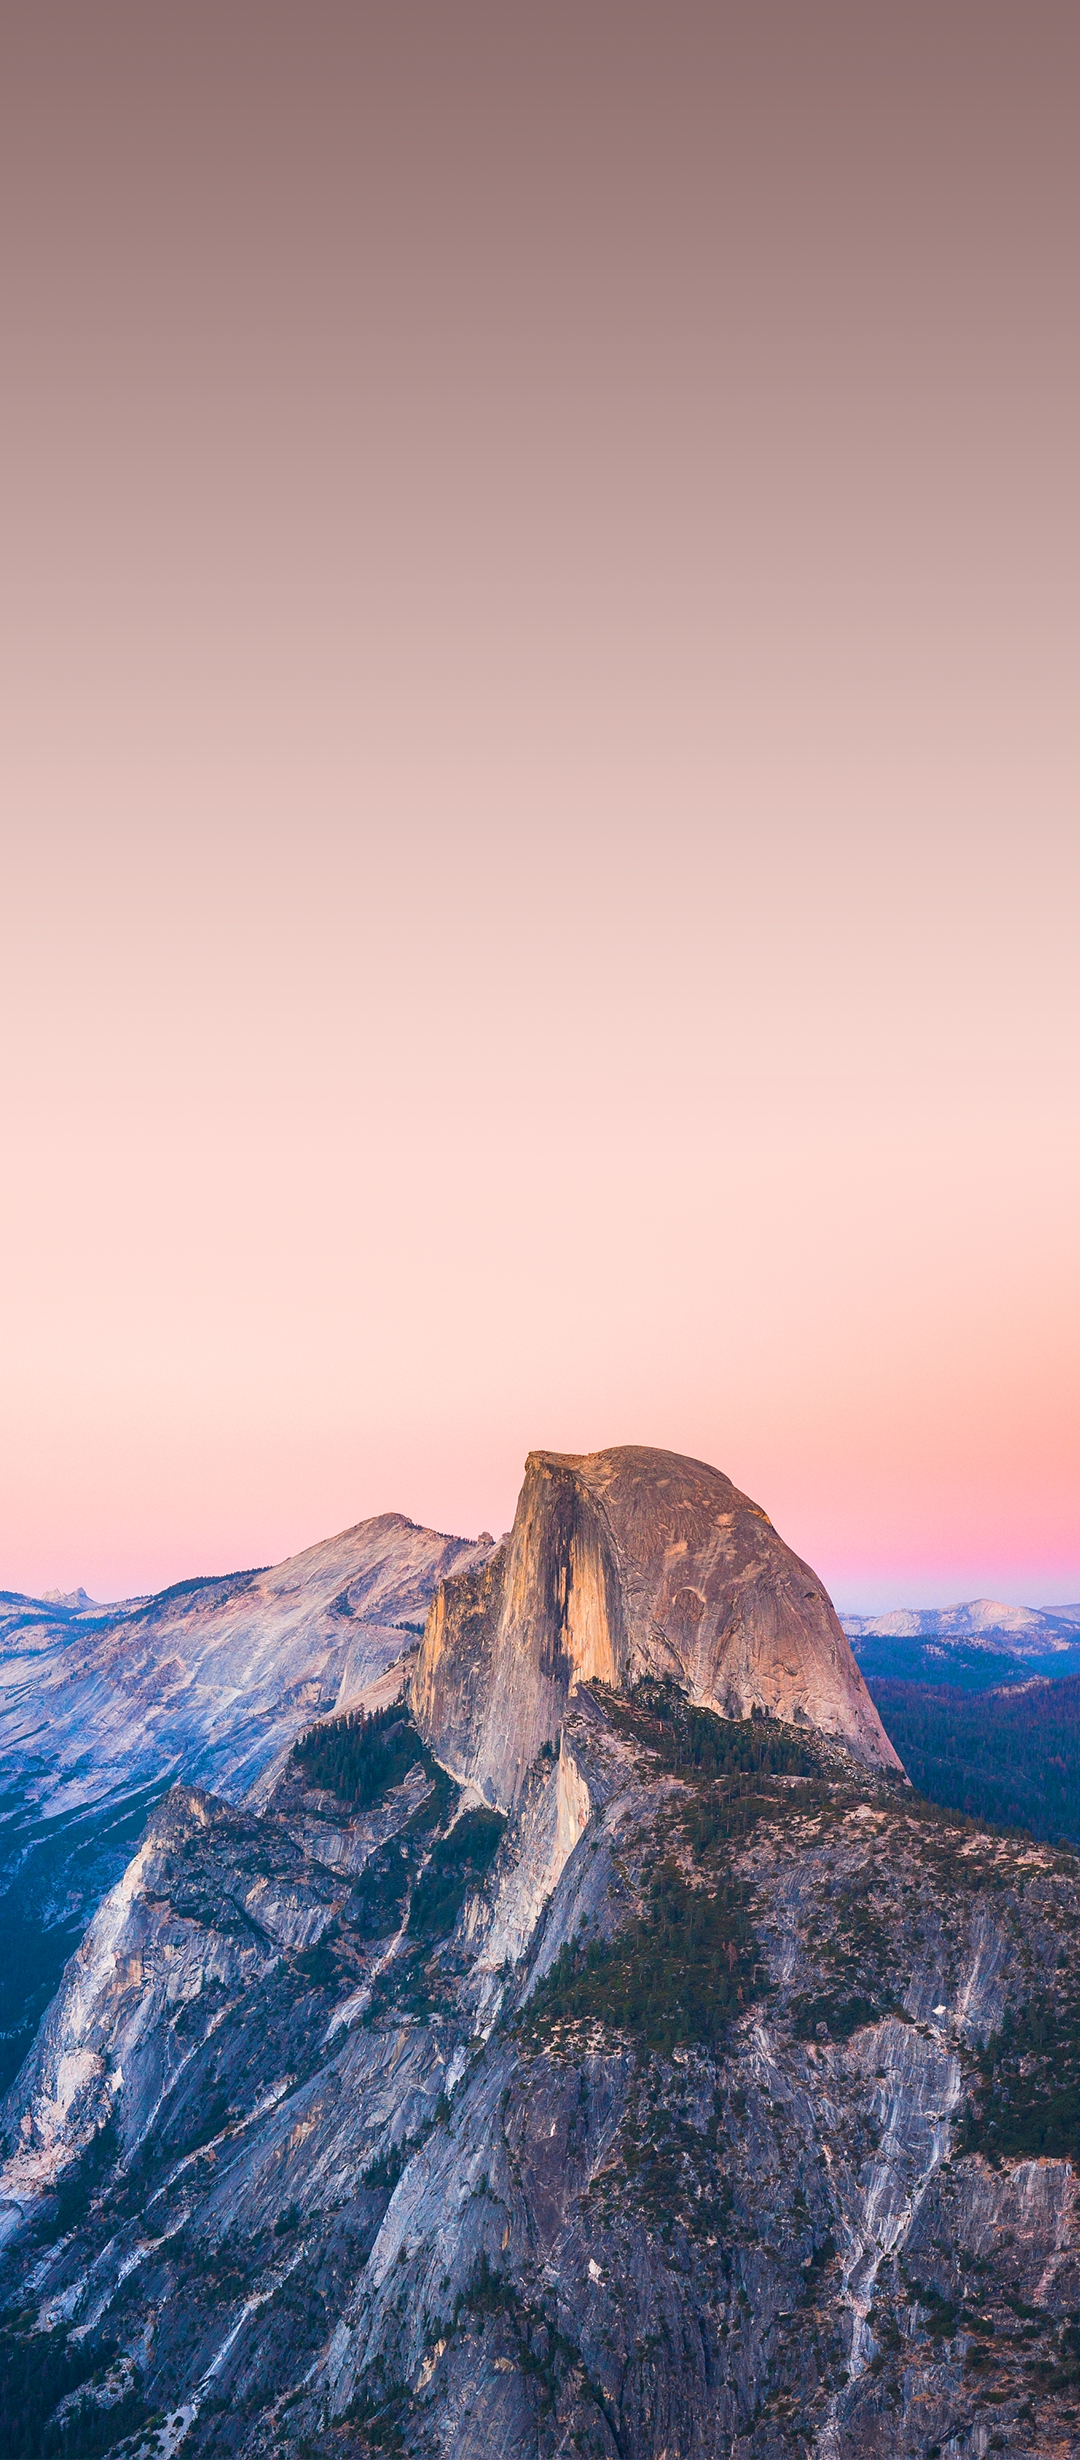 cool phone wallpaper landscape mountain